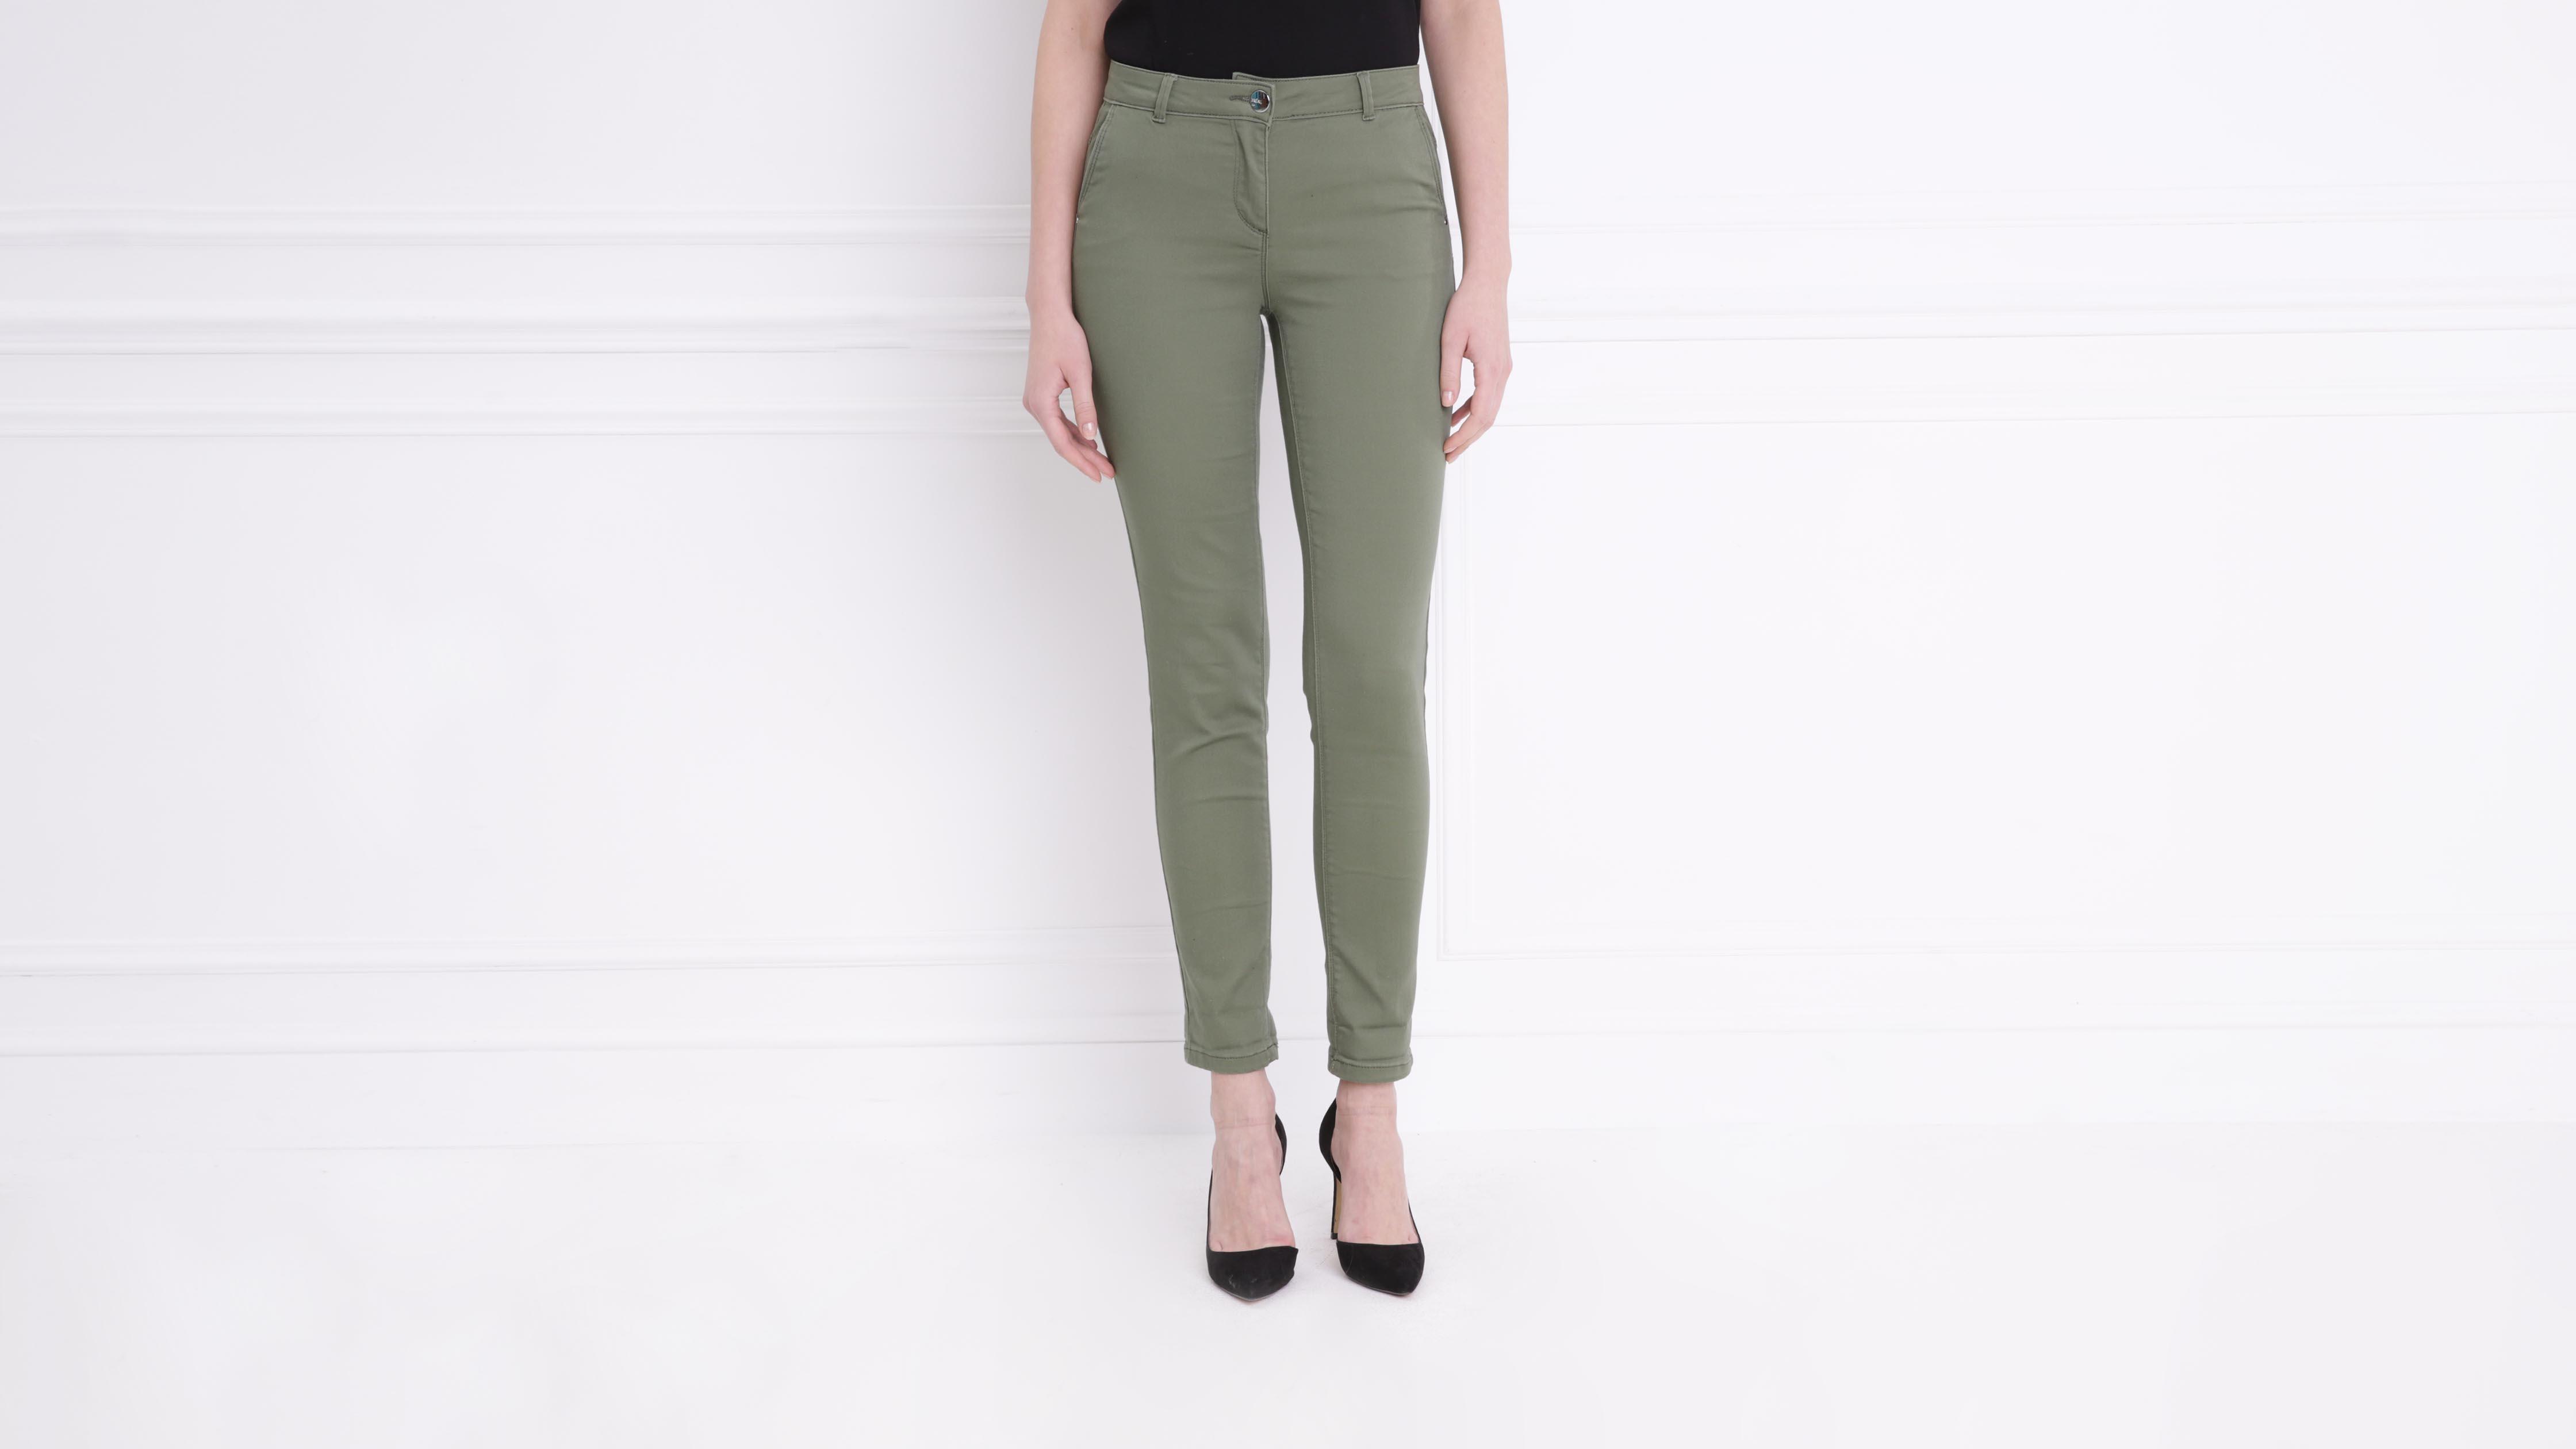 Standard Vert Femme Taille Pantalon Kaki yY6gvbf7